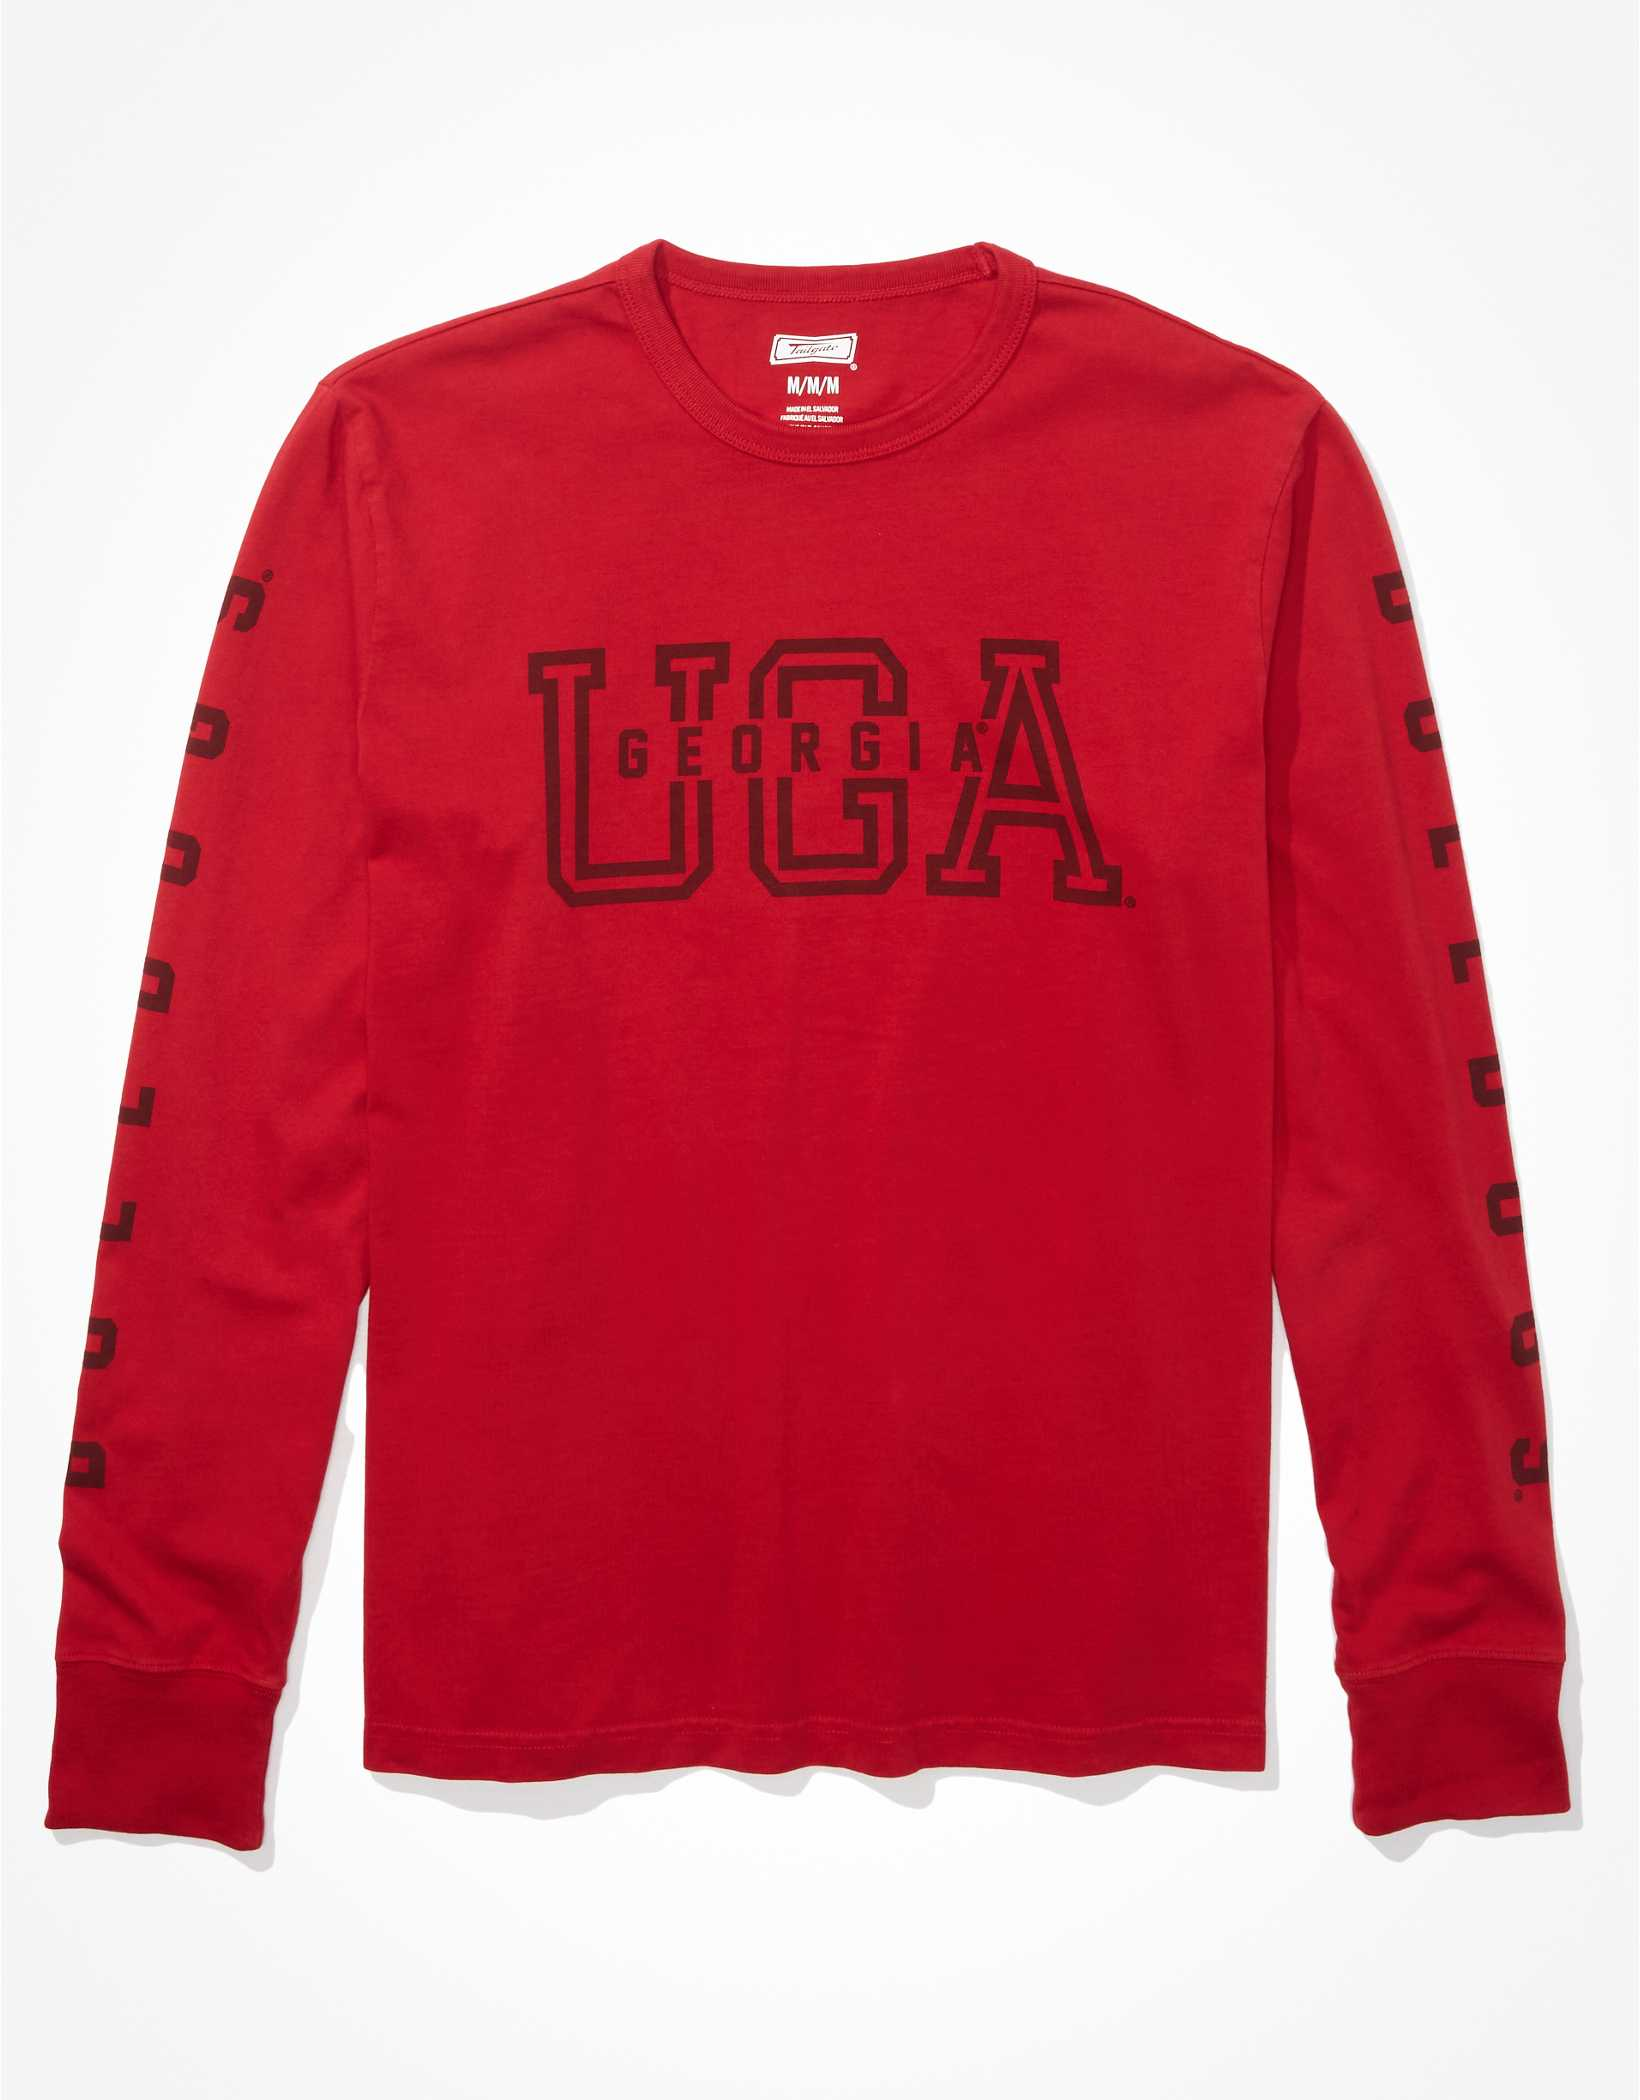 Tailgate Men's Georgia Bulldogs Long-Sleeve Graphic T-Shirt